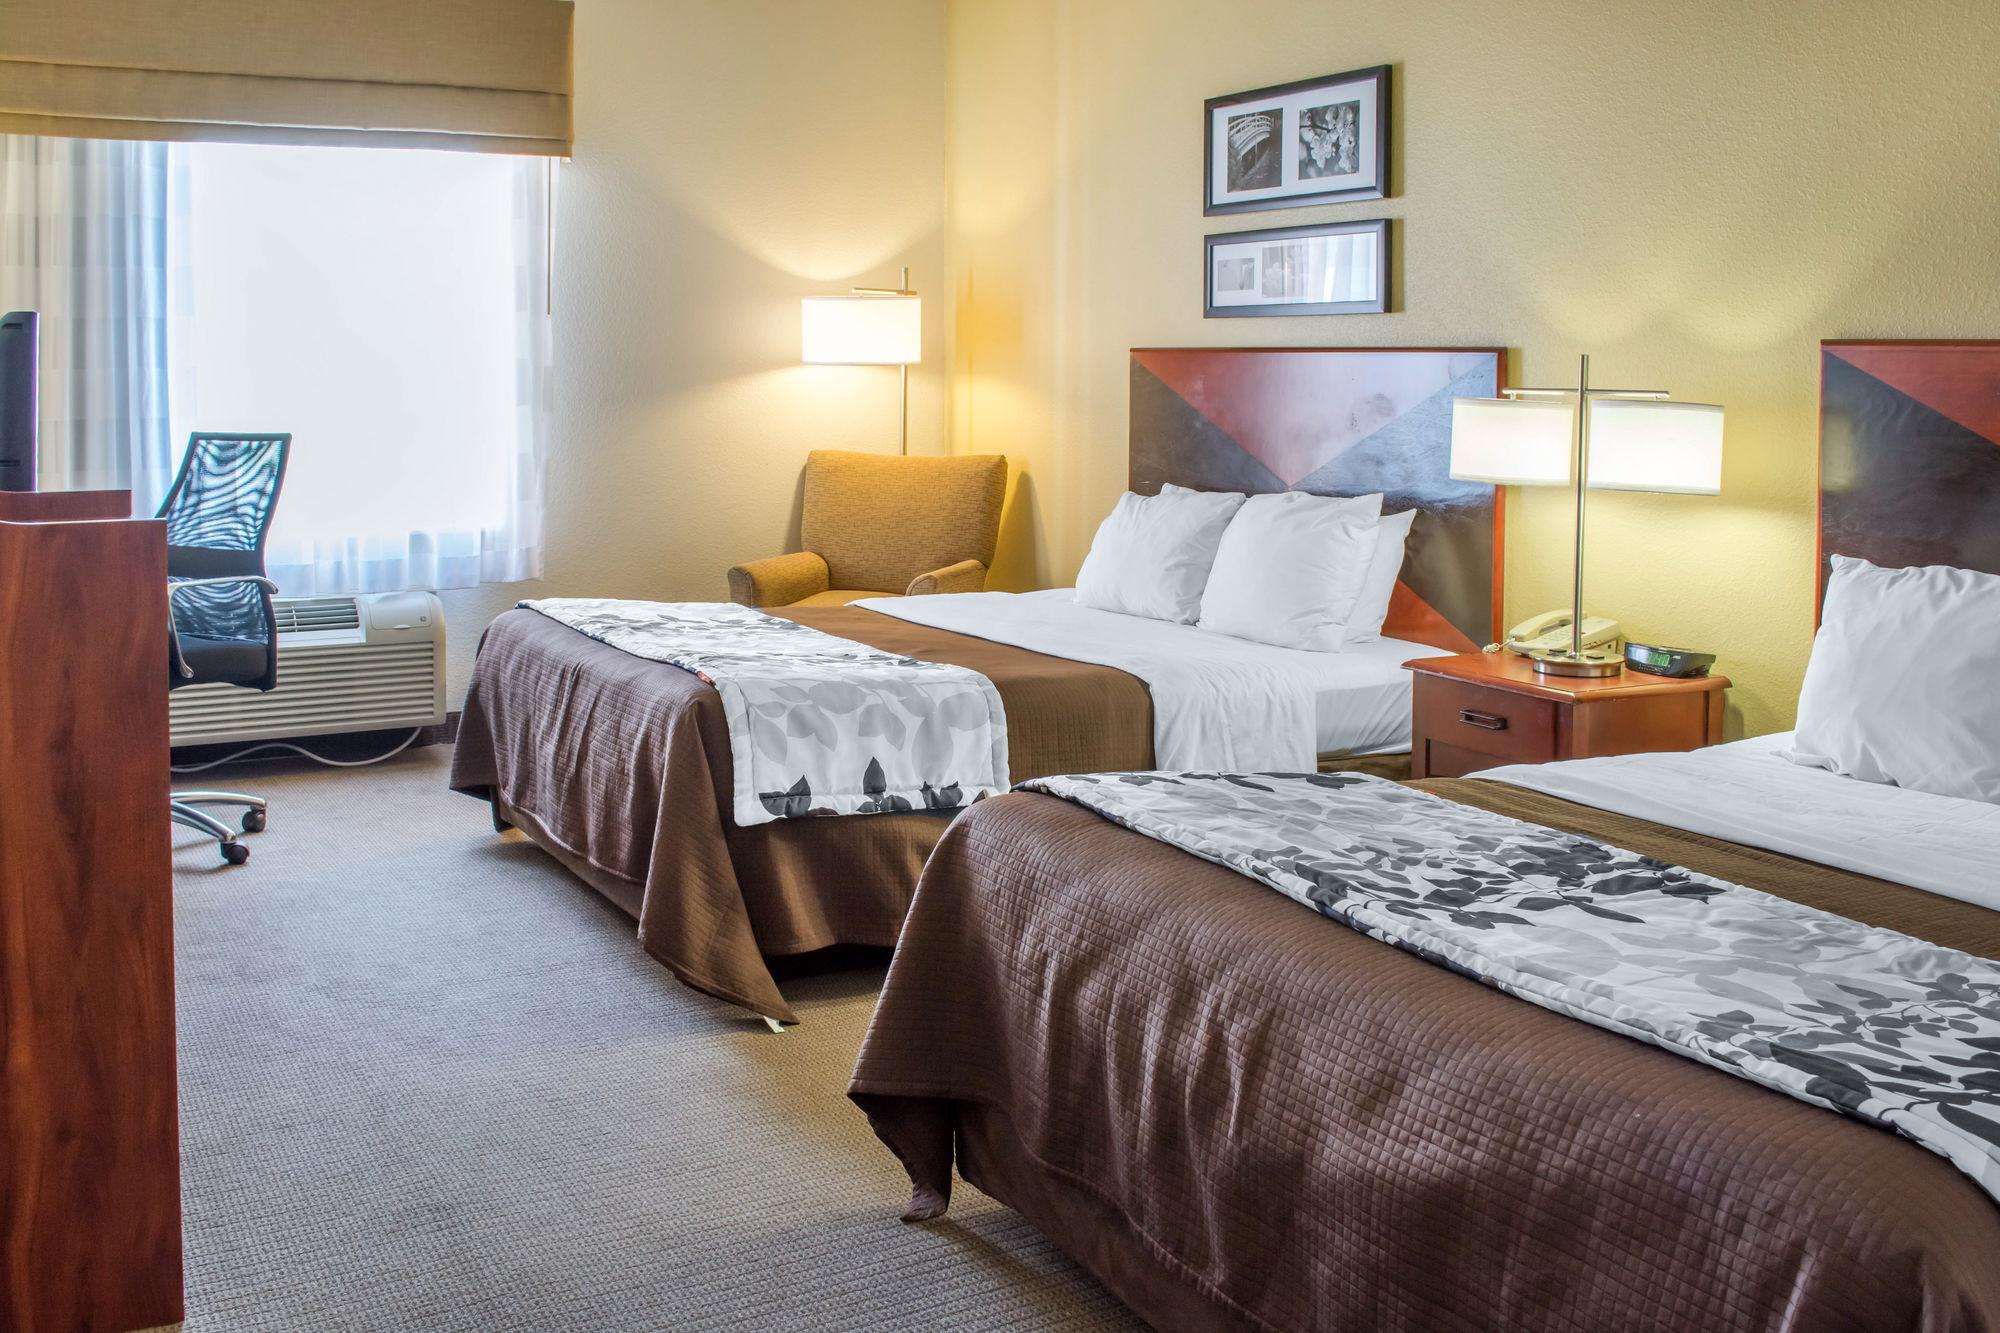 Sleep Inn & Suites in Dublin, VA